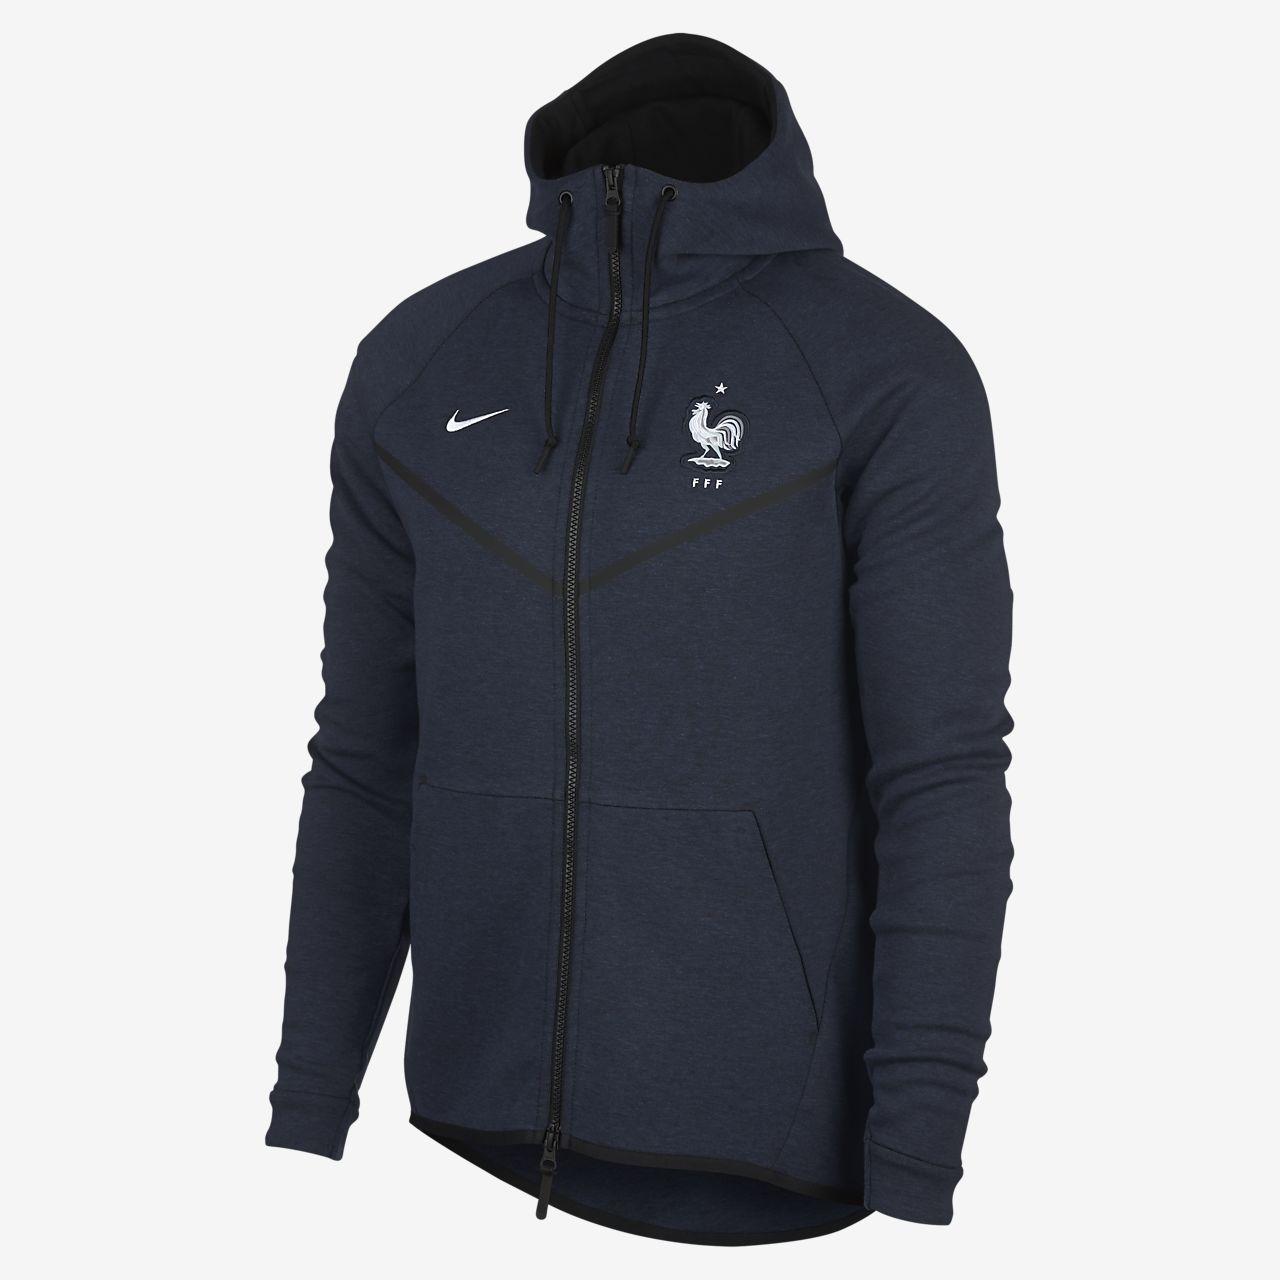 FFF Tech Fleec Windrunner-jakke (mænd)